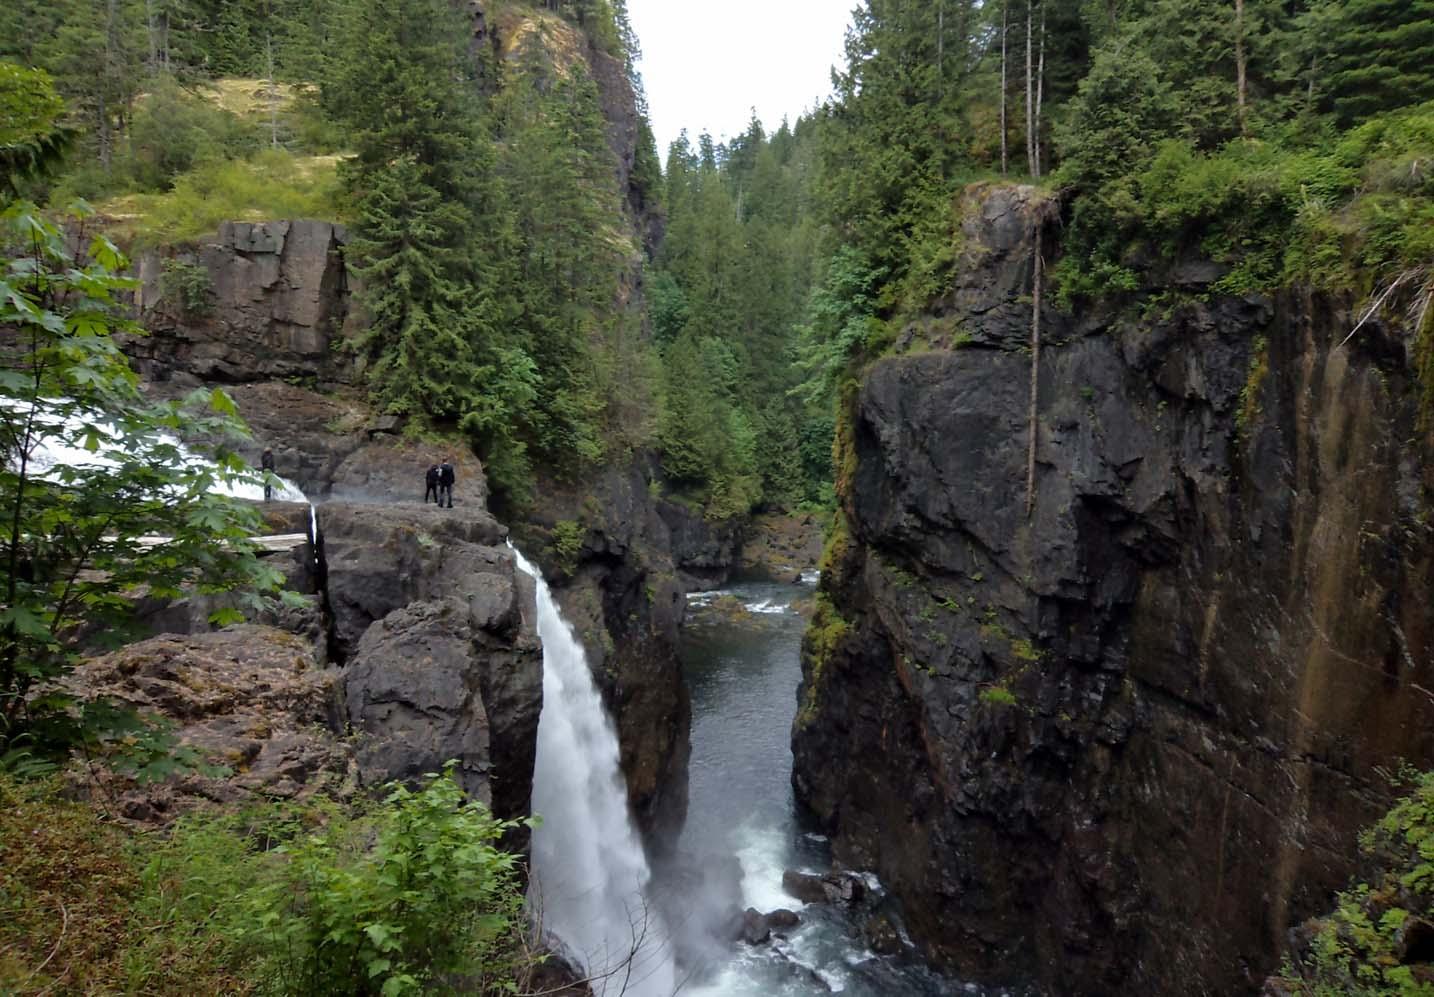 Canyon and falls at Elk Falls Provincial Park near Campbell River